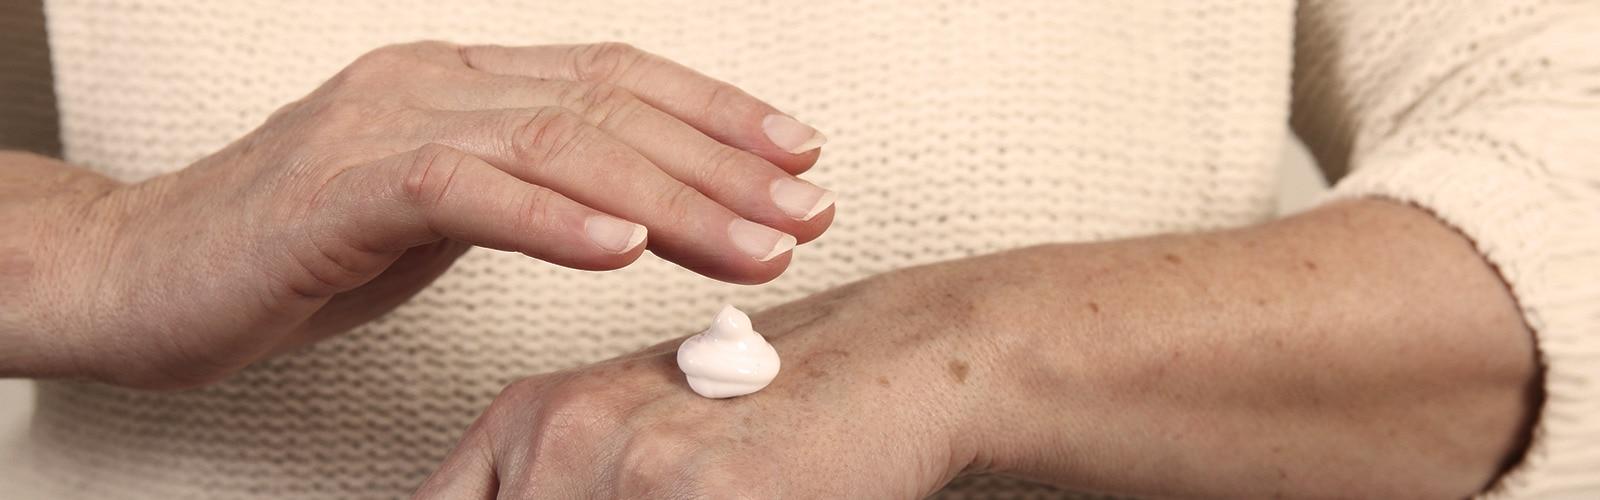 Elderly woman applying moisturizer